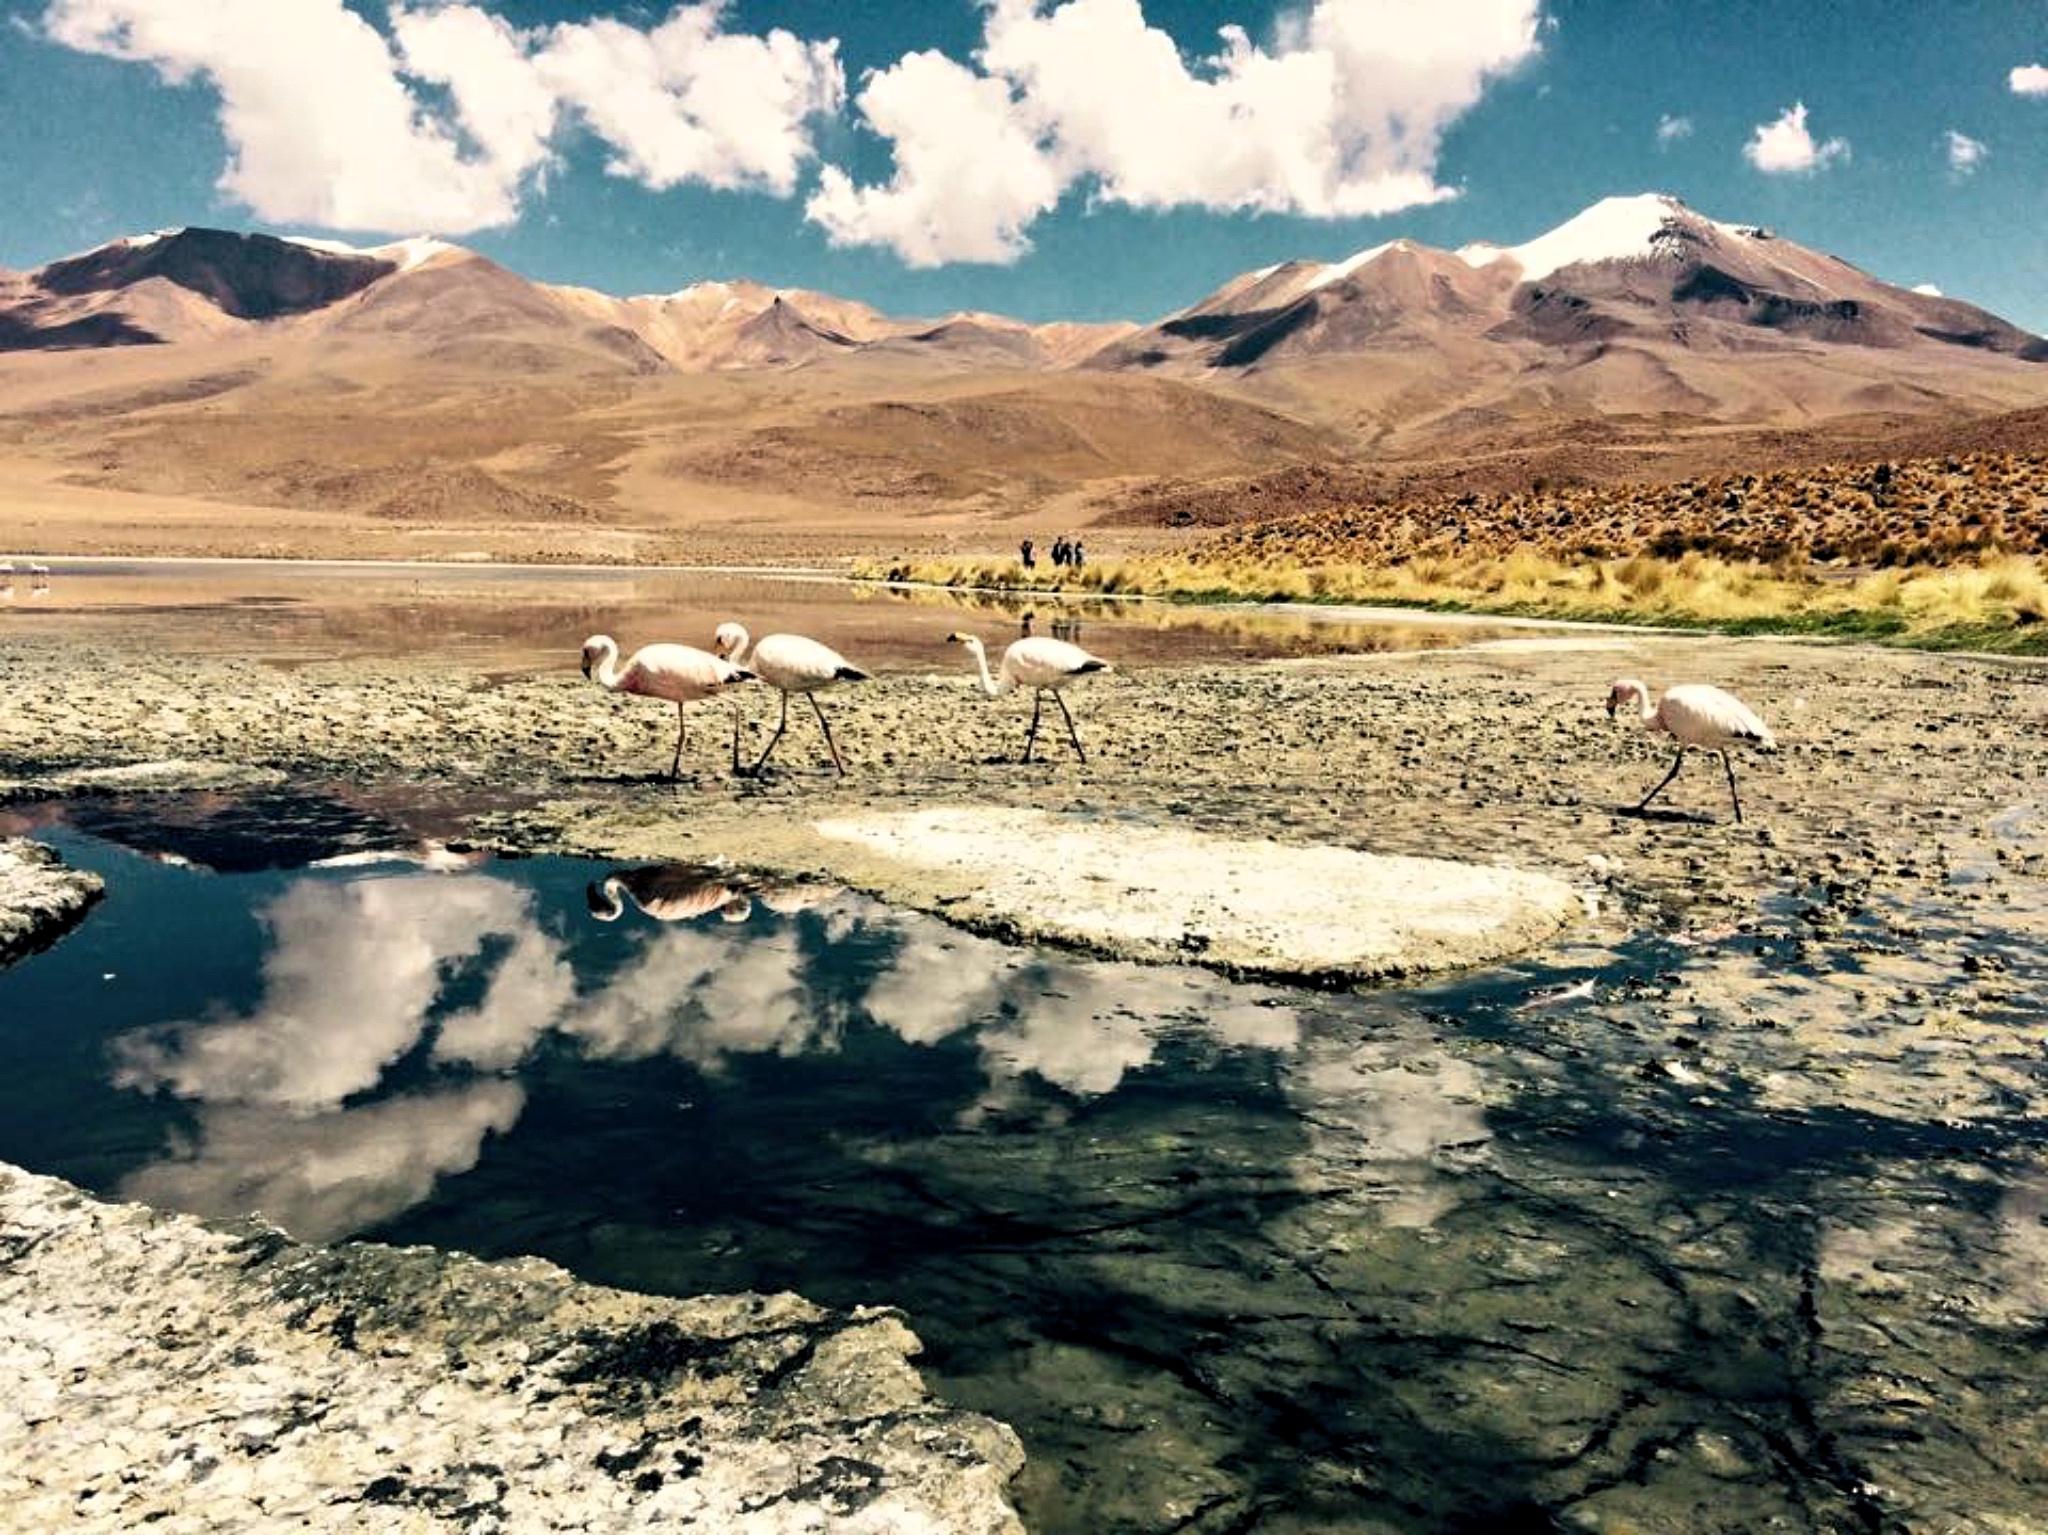 Bolivien: Laguna Capina im Nationalpark Reserva Nacional de Fauna, der meistbesuchte Nationalpark Boliviens. Foto: Maximilian Imhof